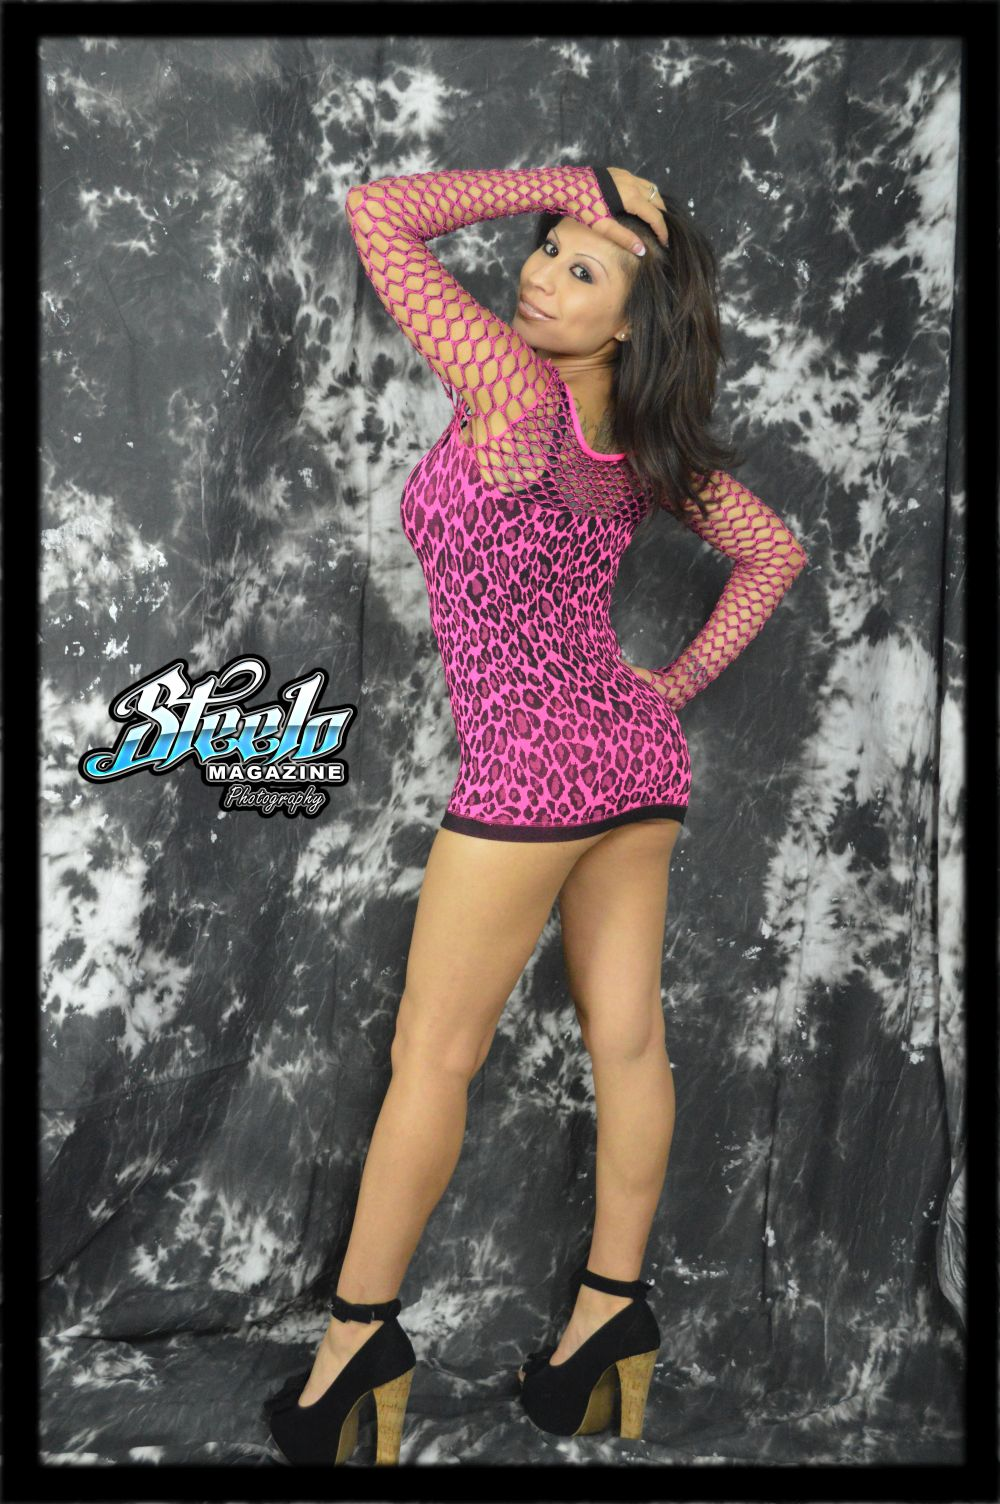 monica-p-steelo-magazine-shoot-968